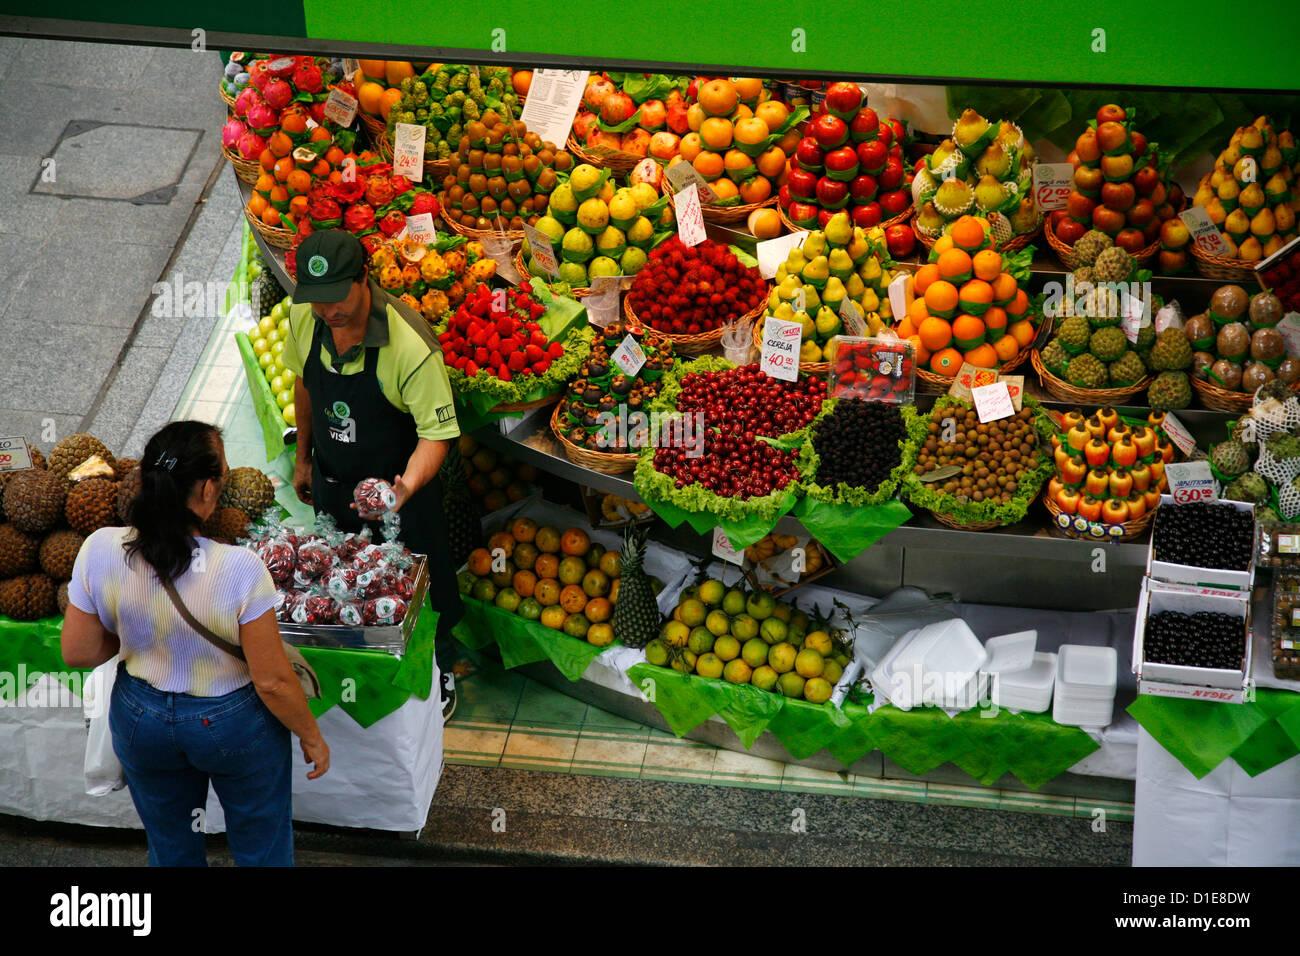 Fruit stall, Mercado Municipal, Sao Paulo, Brazil, South America - Stock Image